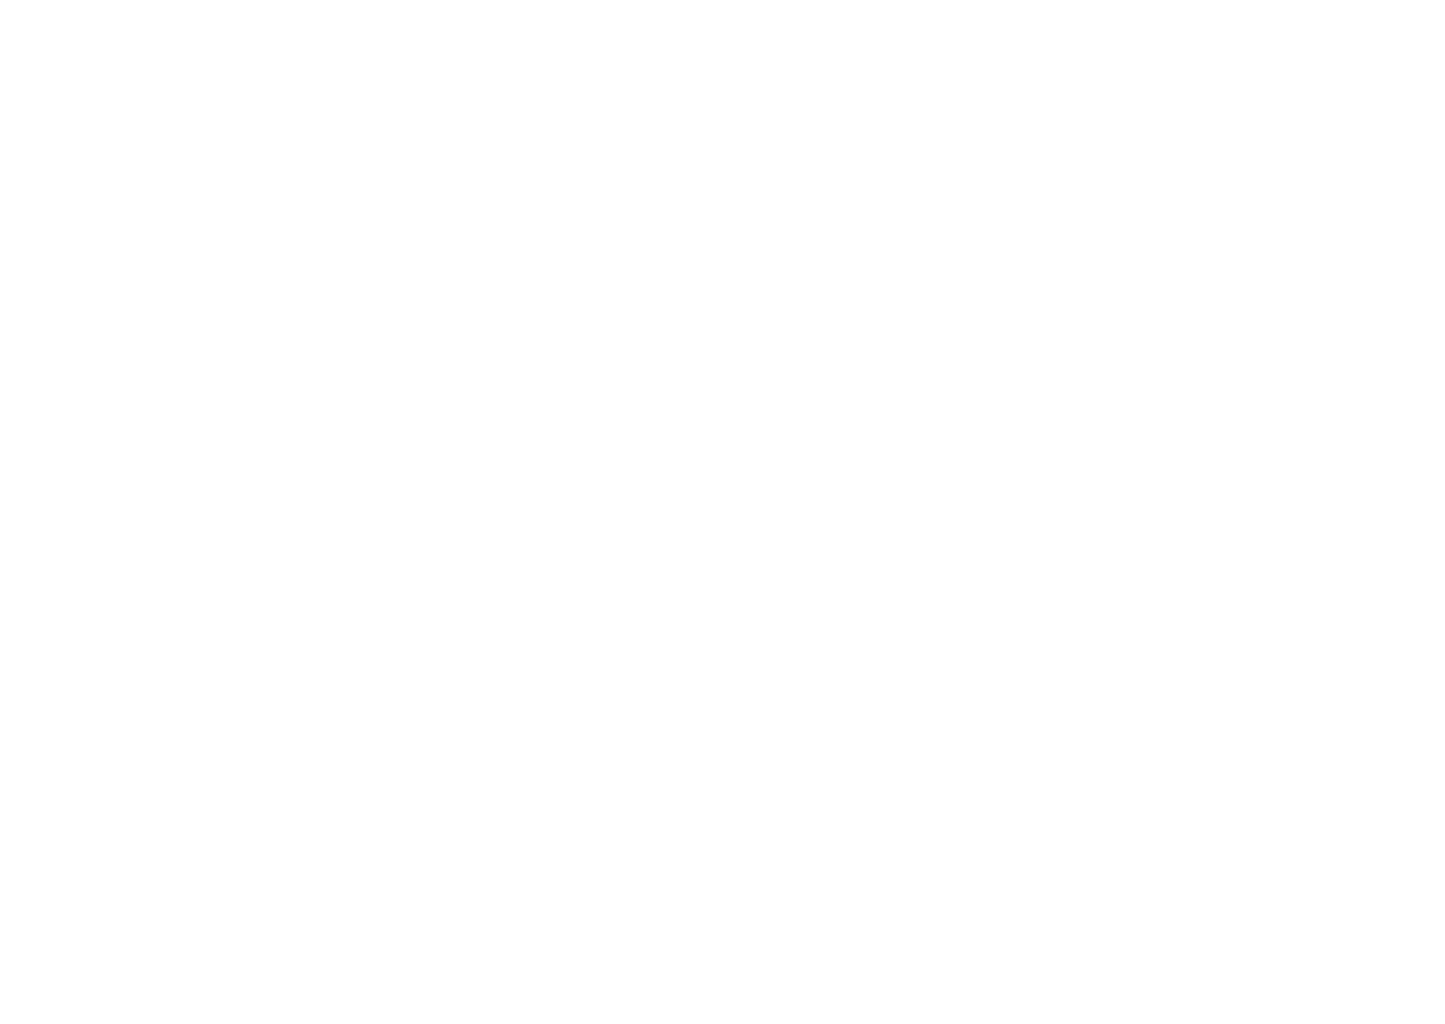 Eric N. Wright